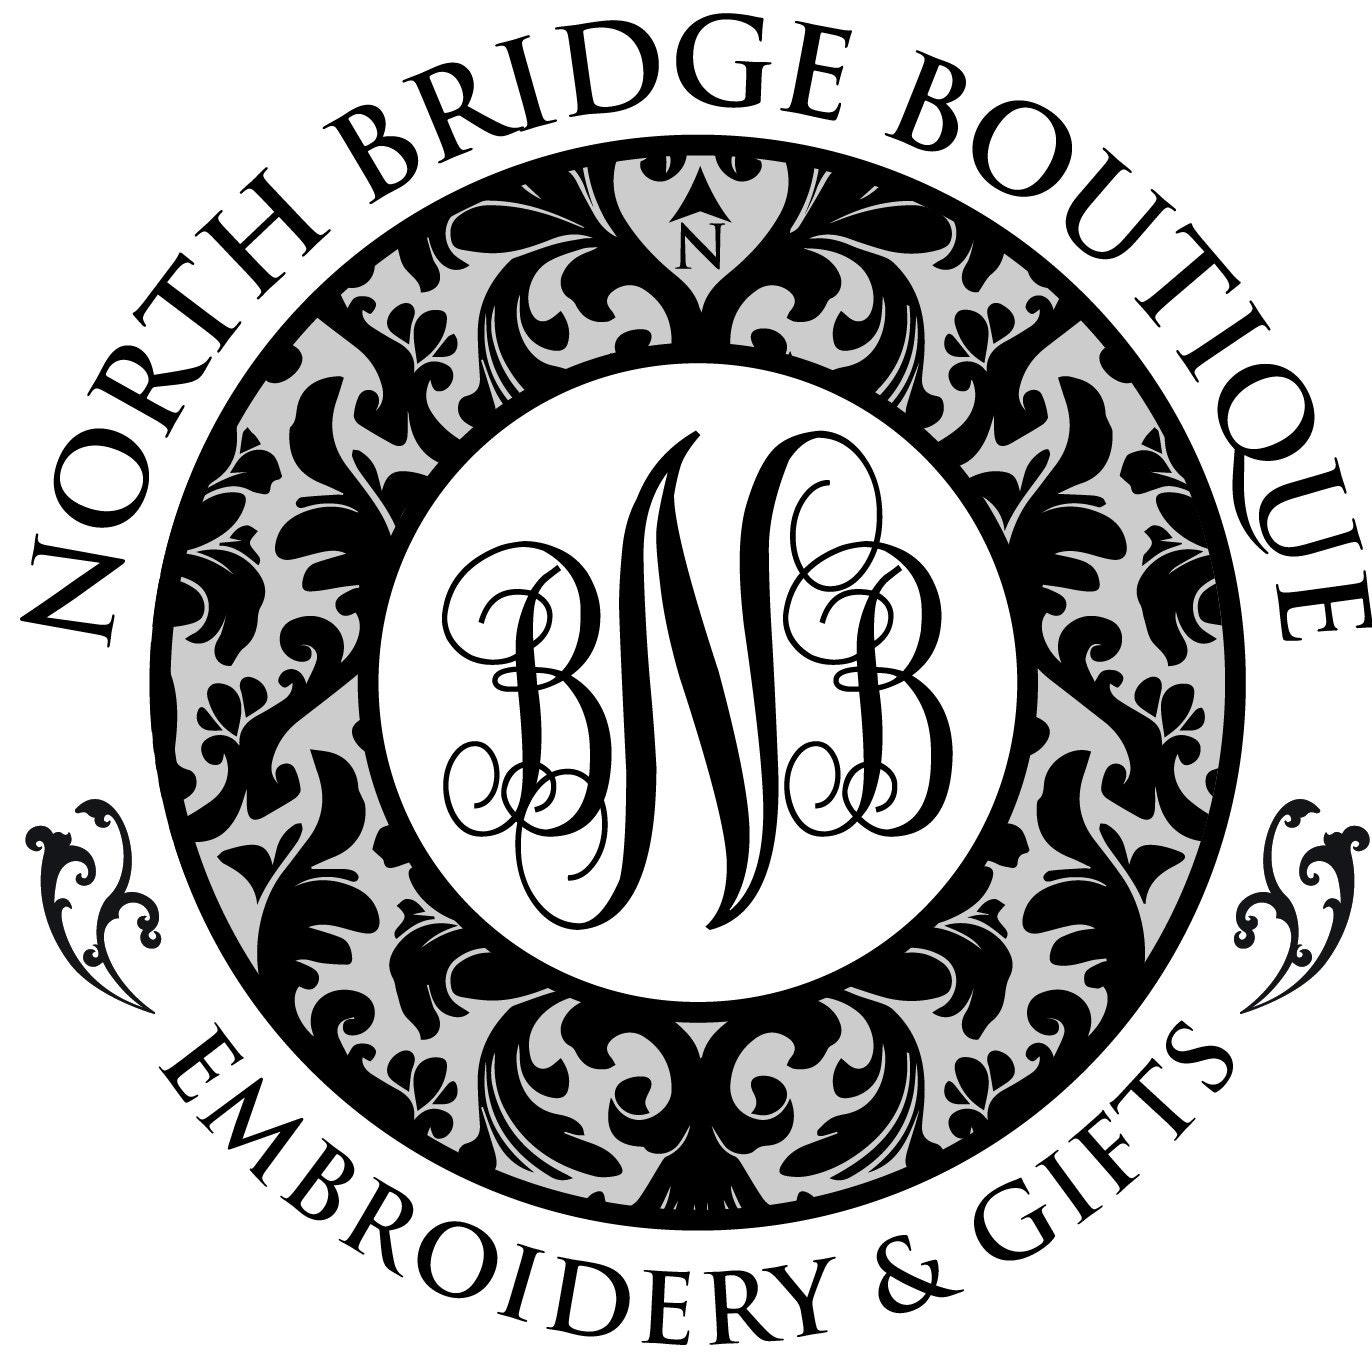 North Bridge Boutique